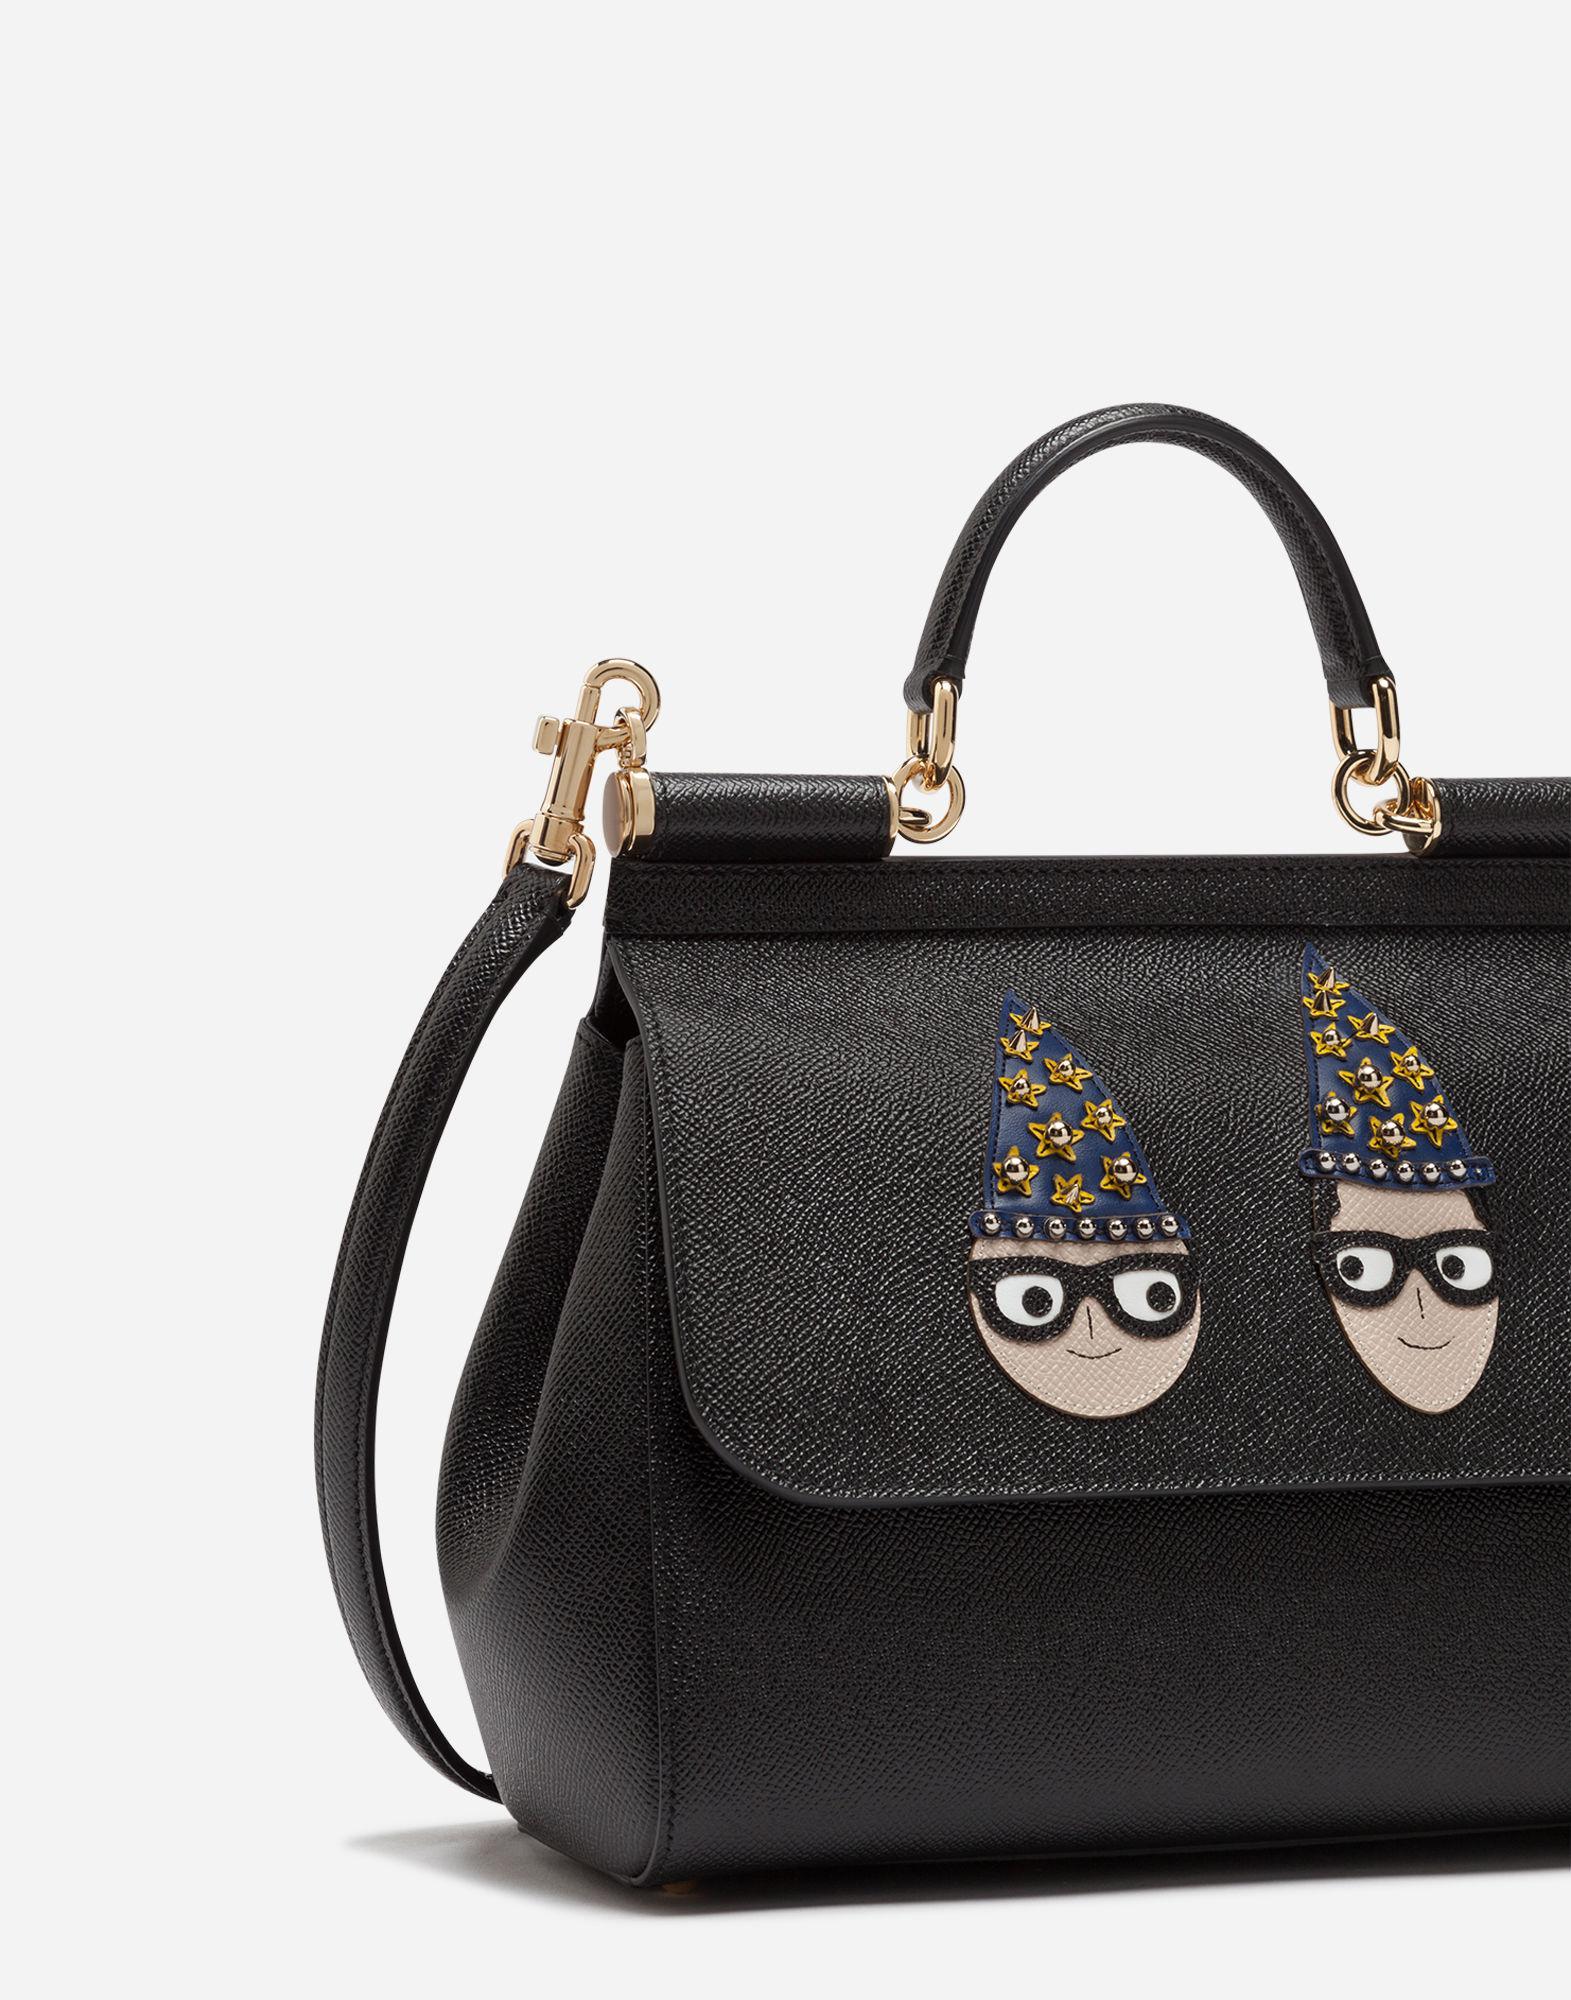 Lyst - Dolce   Gabbana Medium Sicily Bag In Dauphine Calfskin With Patches  Of The Designers in Black d771da68b0571